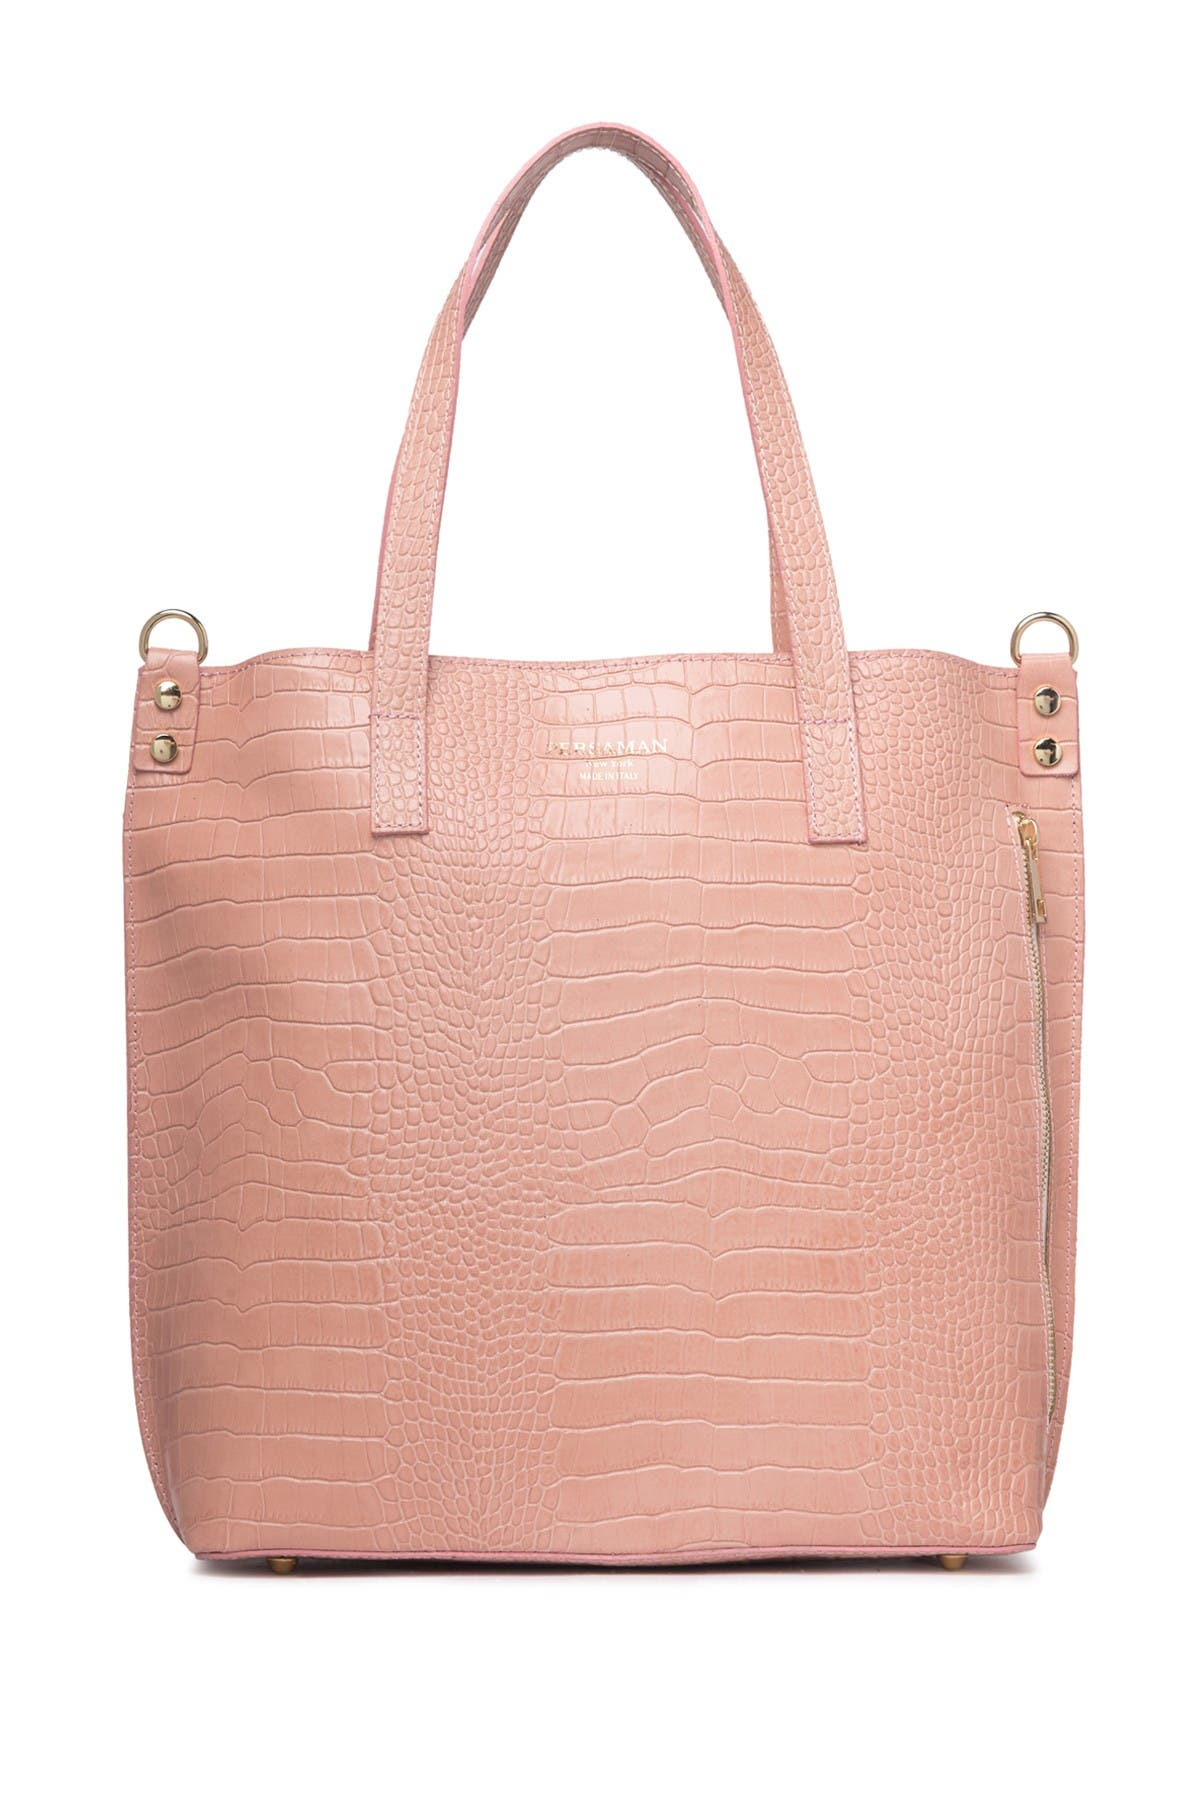 Image of Persaman New York Adeline Embossed Leather Shoulder Bag